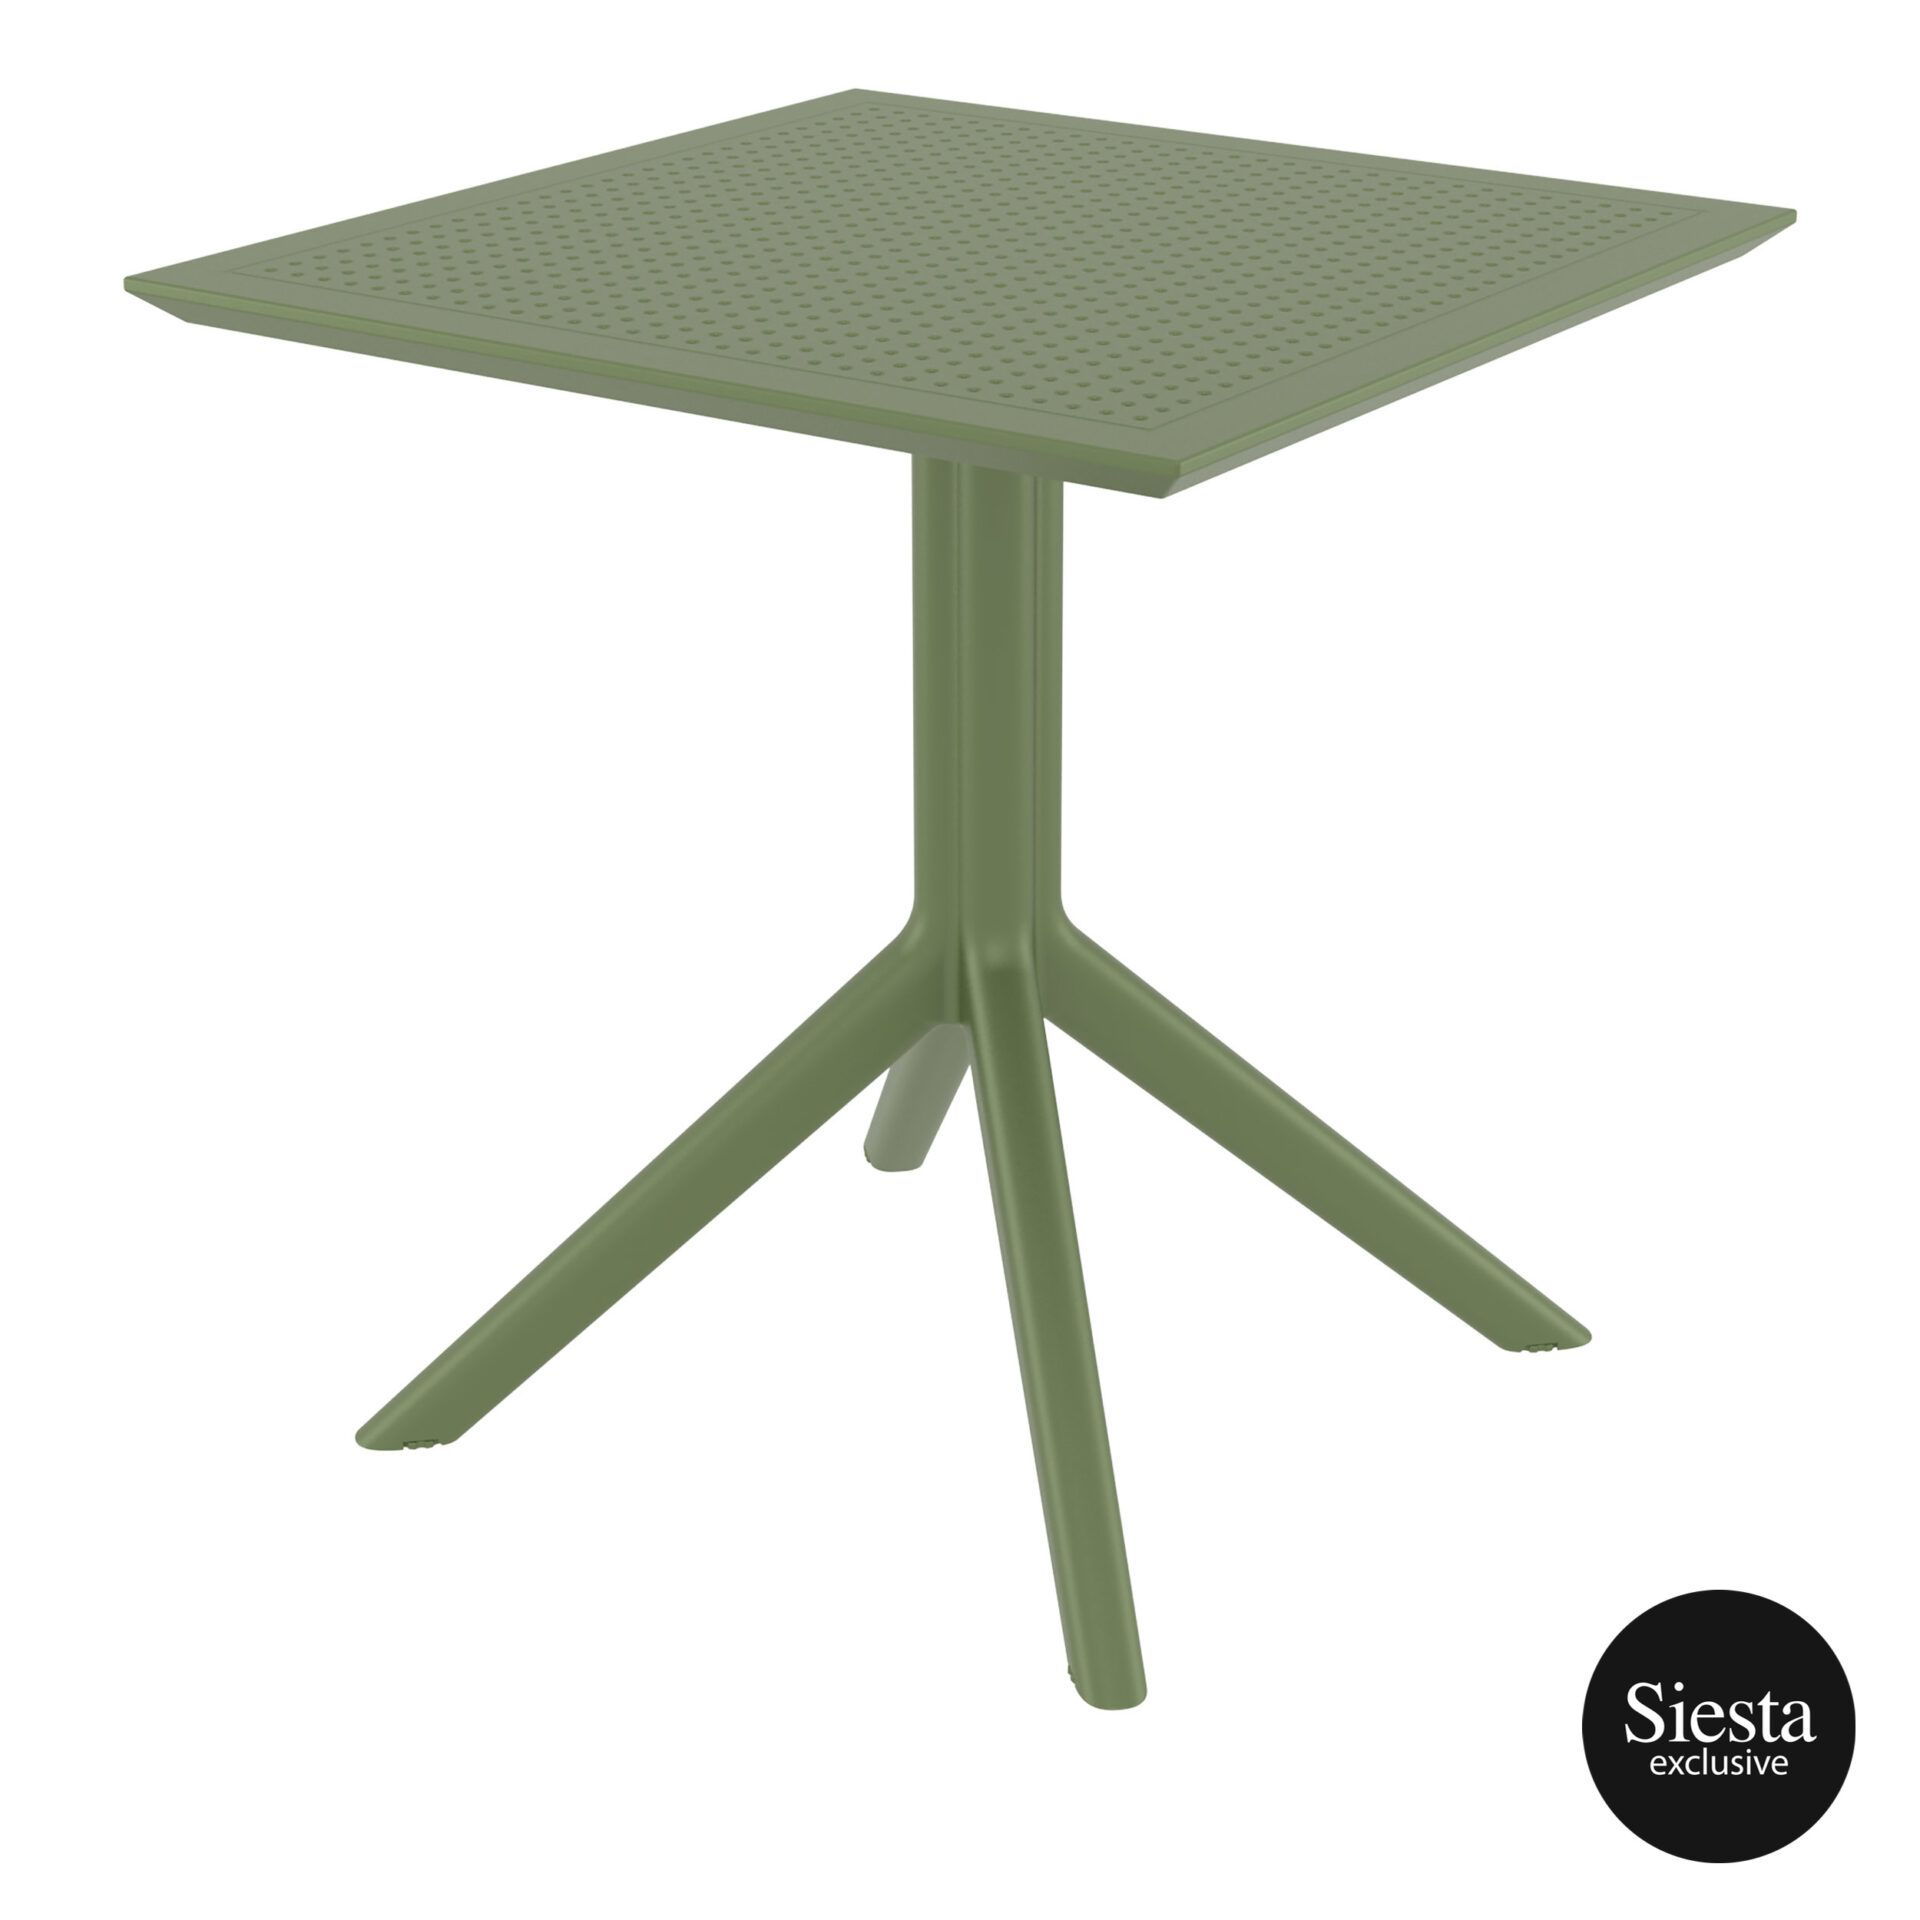 polypropylene outdoor cafe sky table 70 olive green front side 1